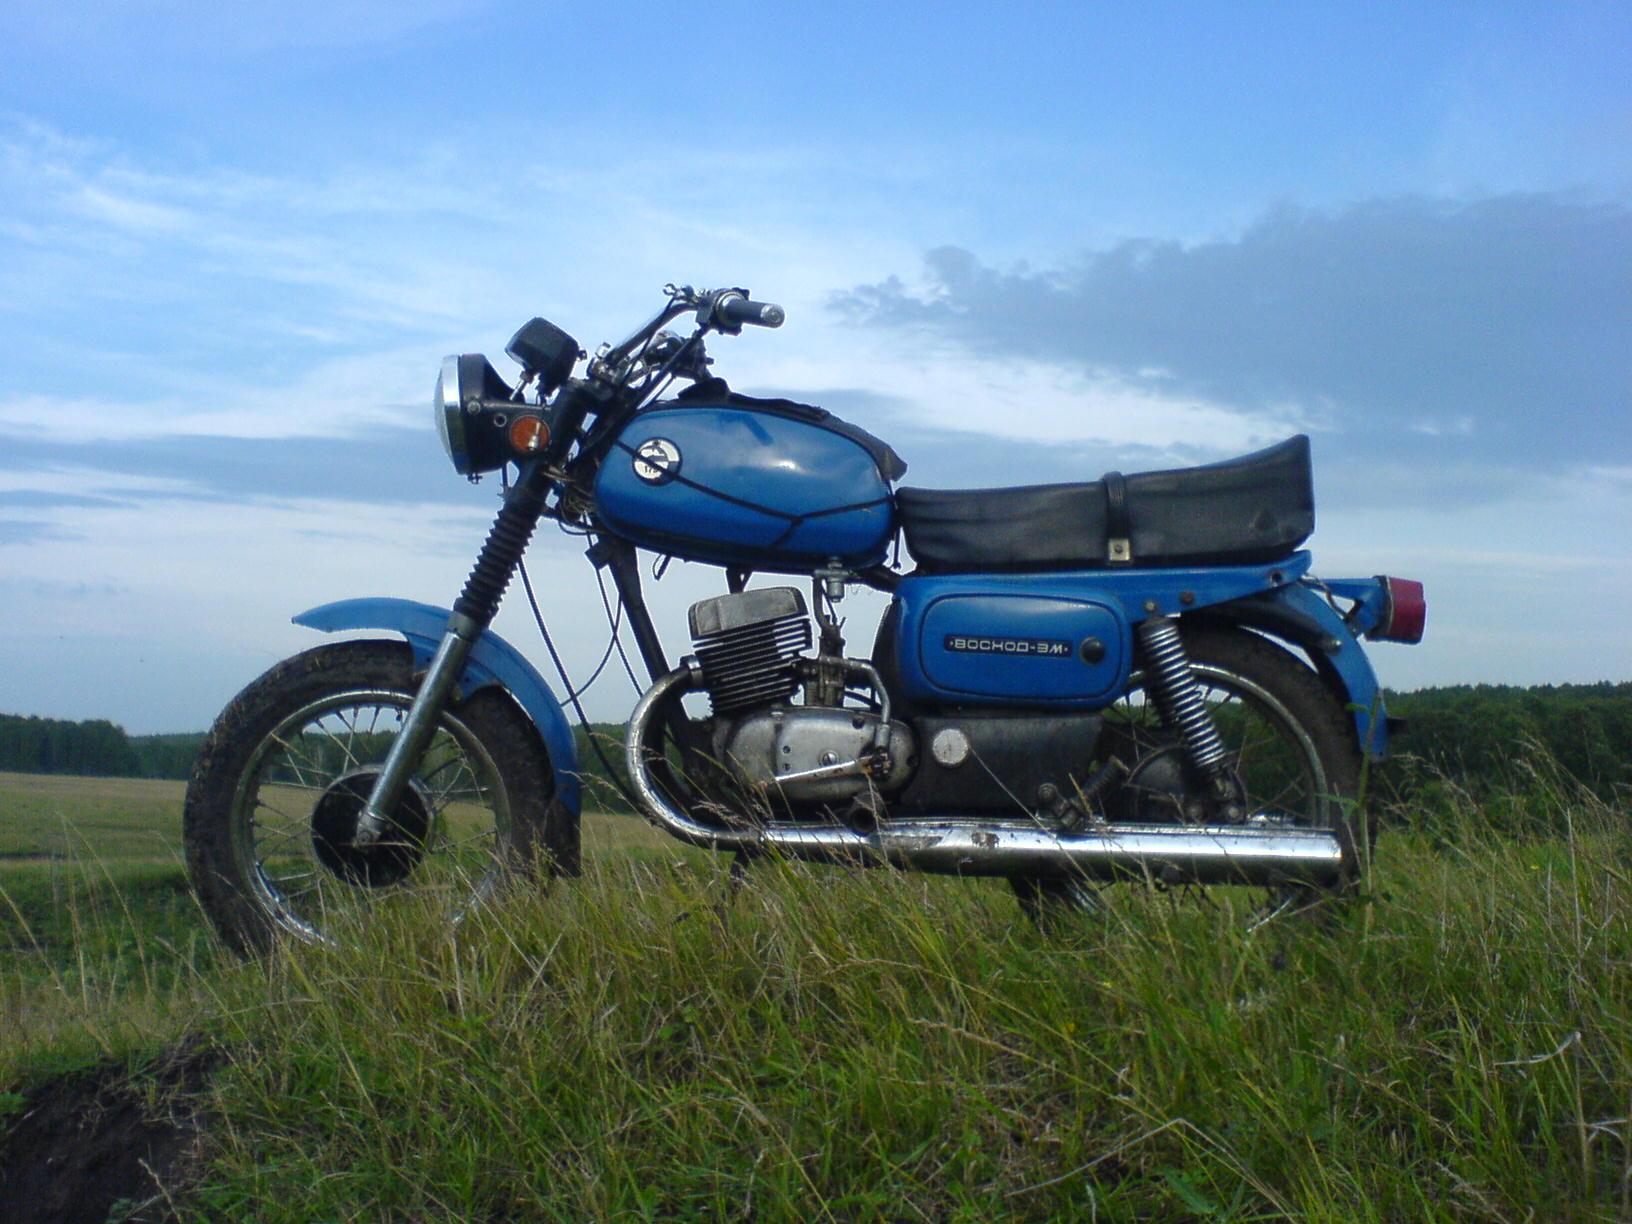 картинки про восхода мотоцикла многих начинающих рукодельниц